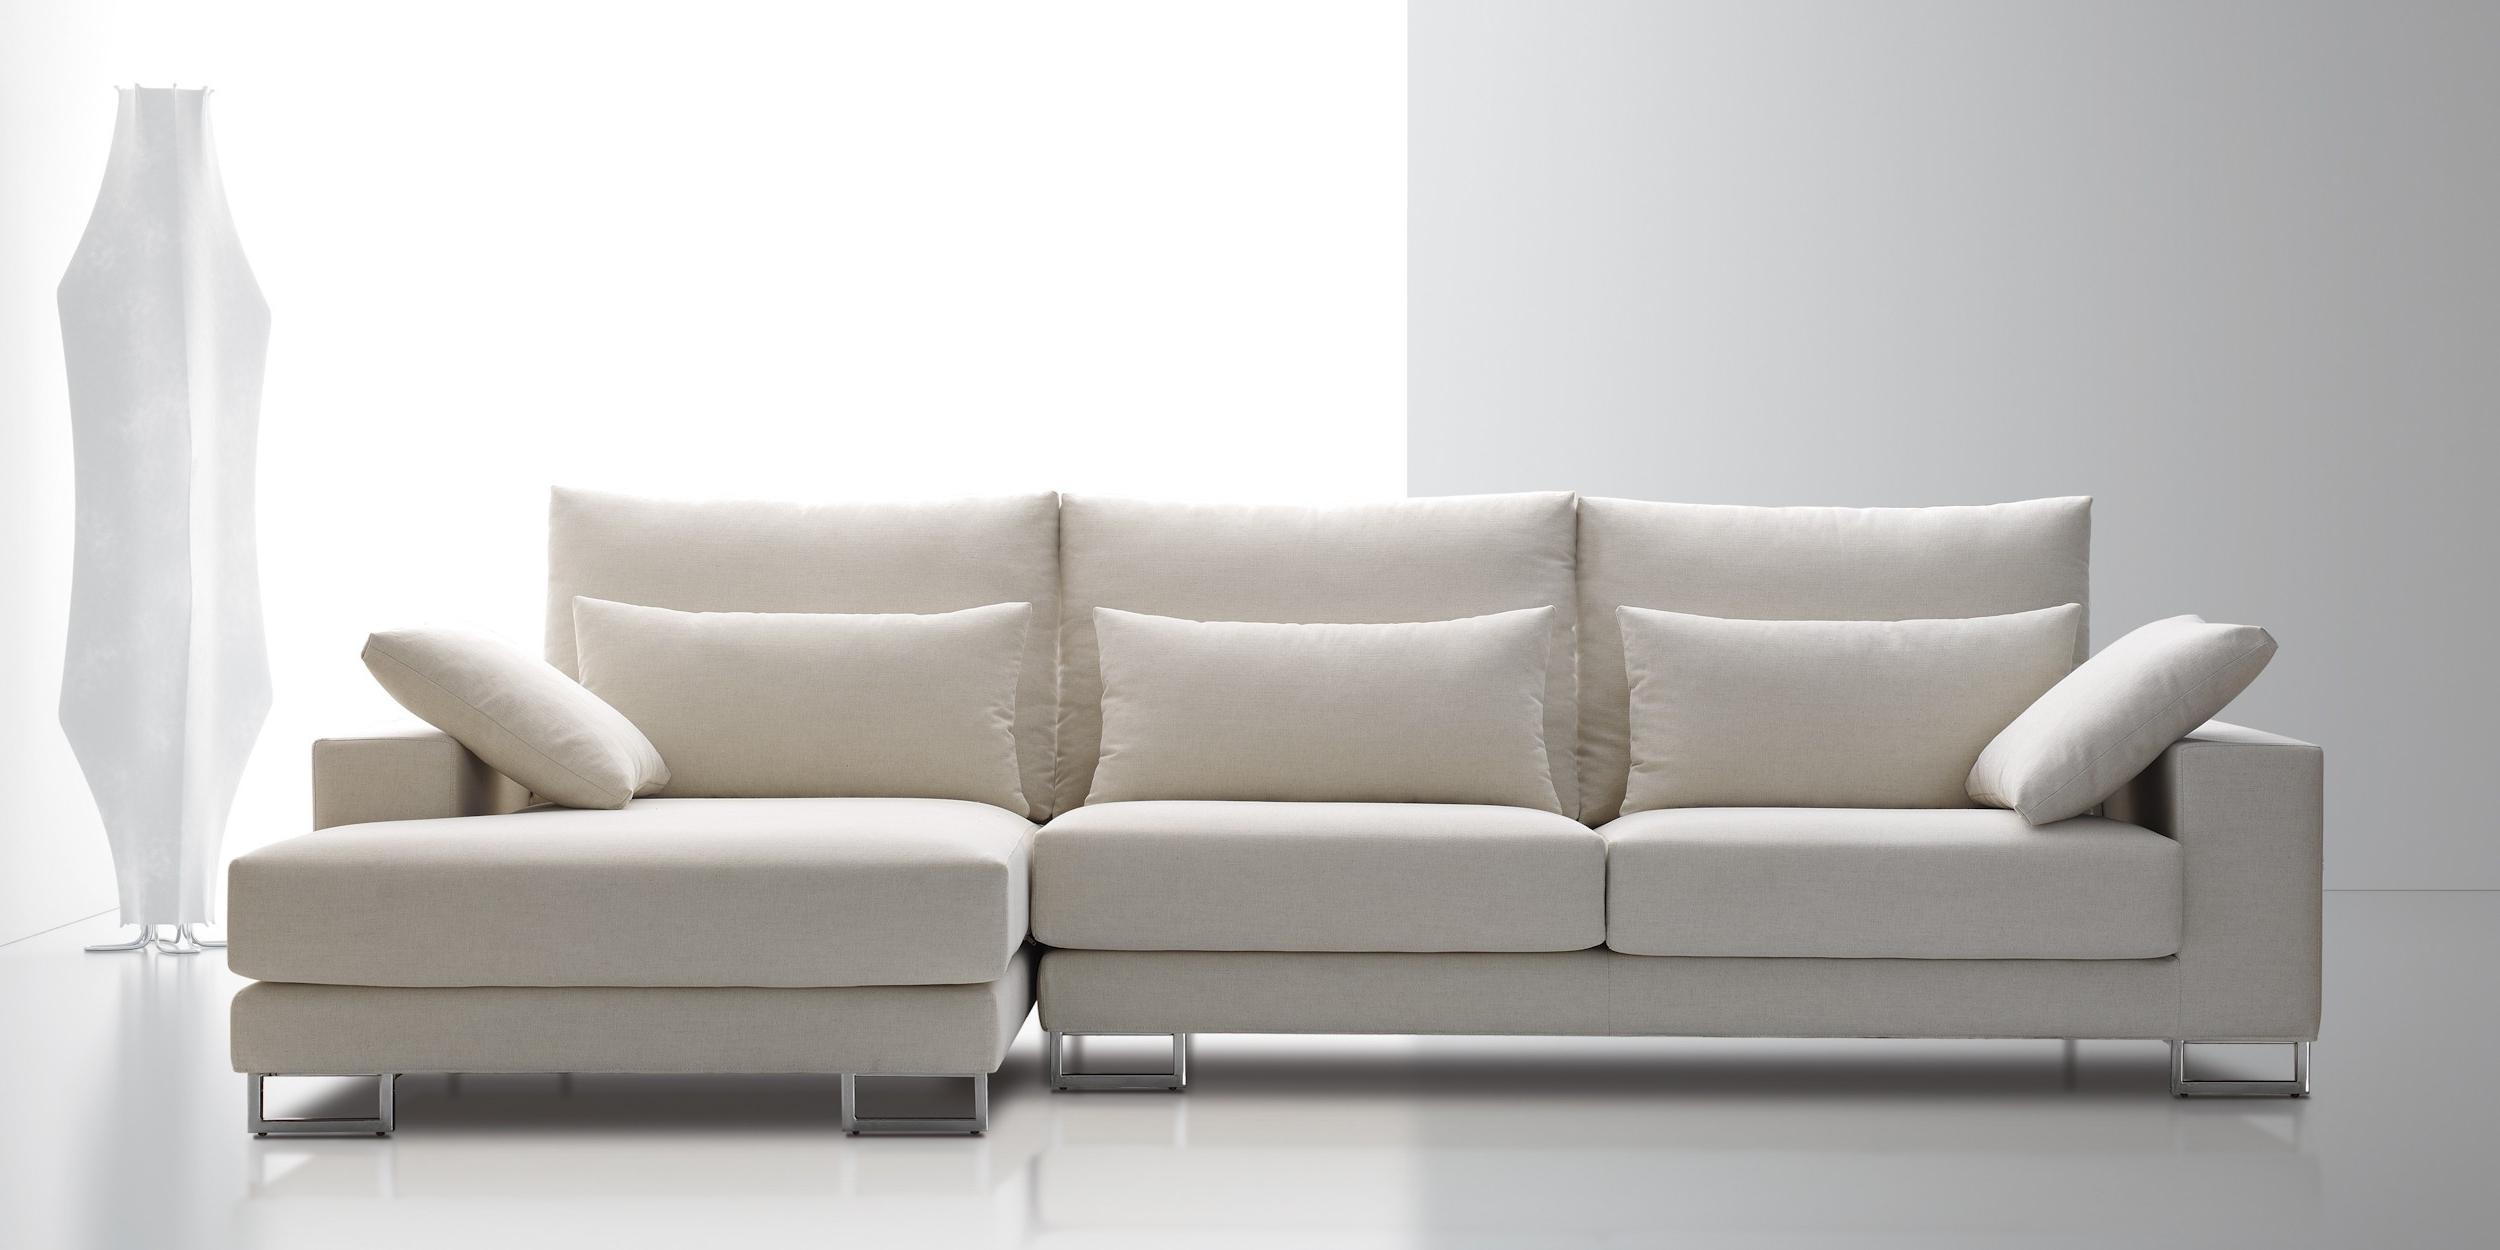 Liquidacion De sofas Por Cierre 9fdy Tienda sofas Madrid sofas Baratos Madrid Prar sofa